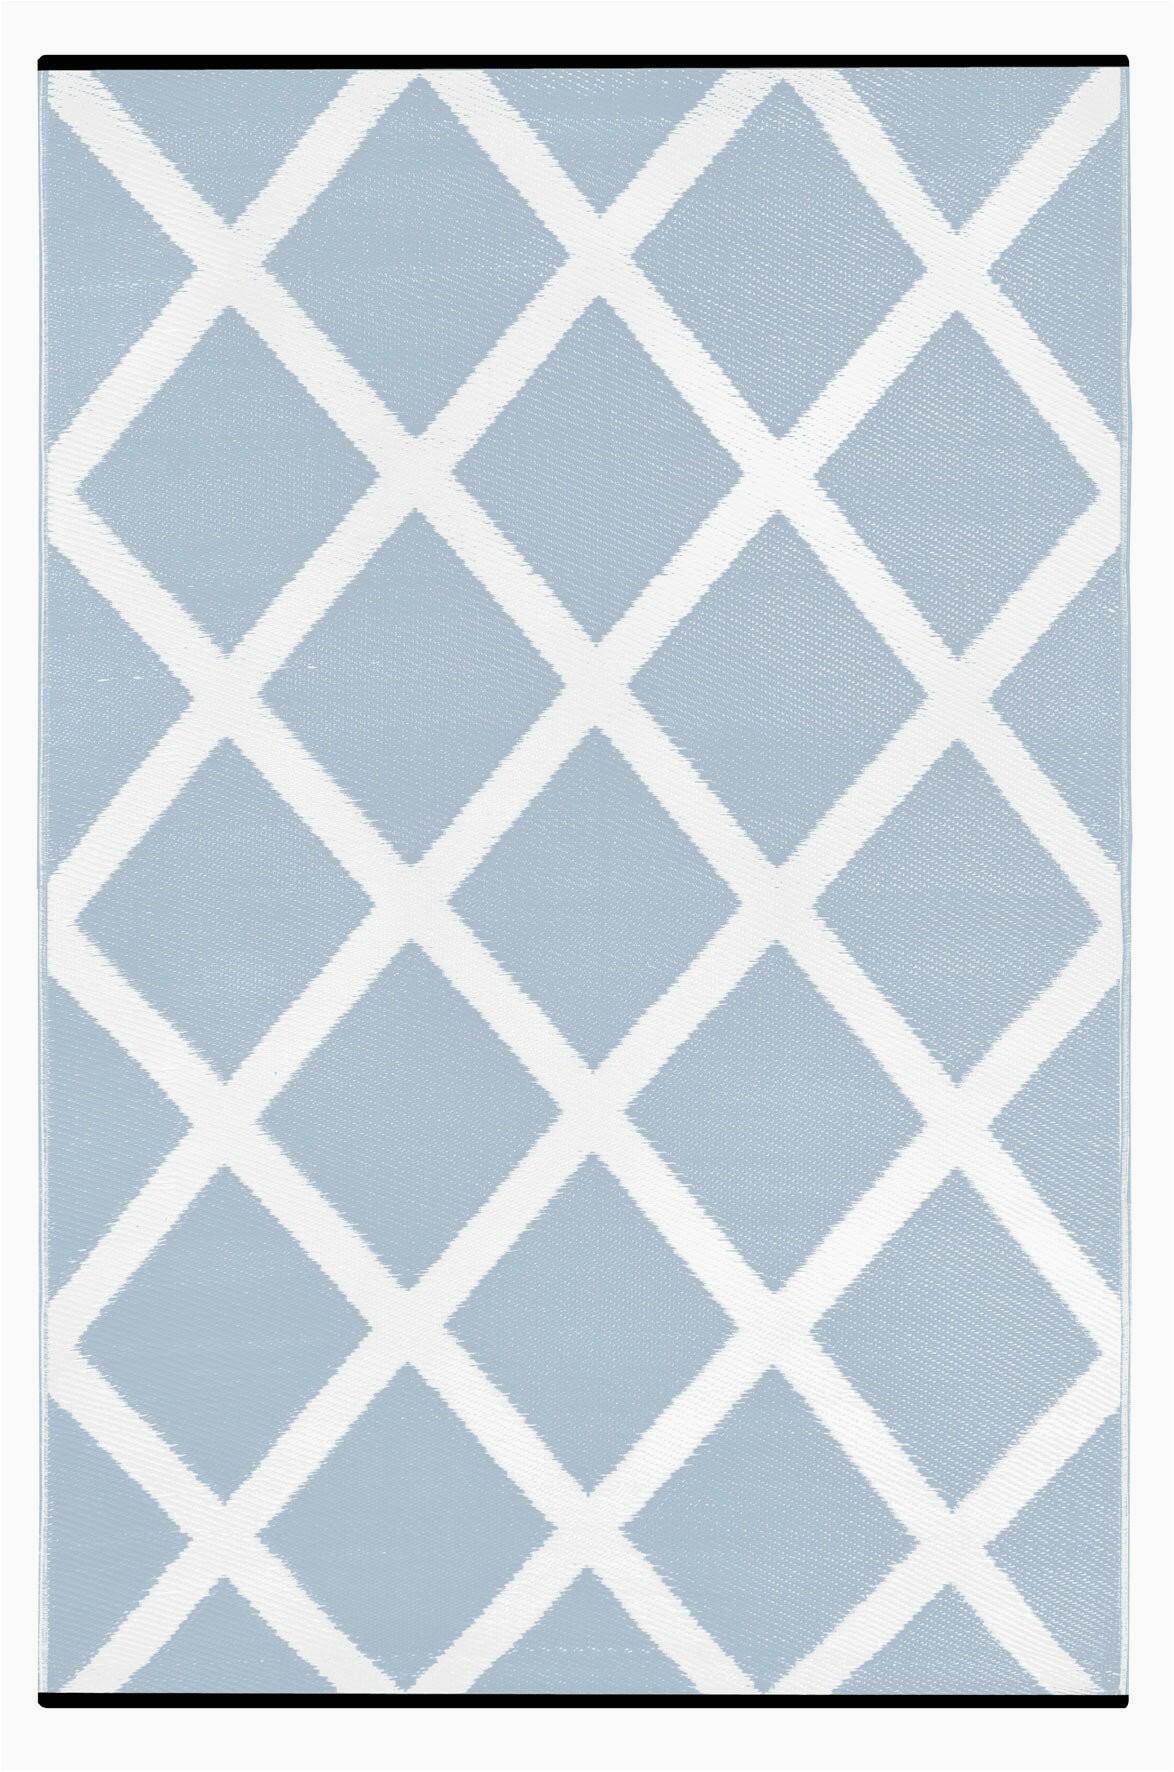 lightweight reversible diamond light bluewhite indooroutdoor area rug